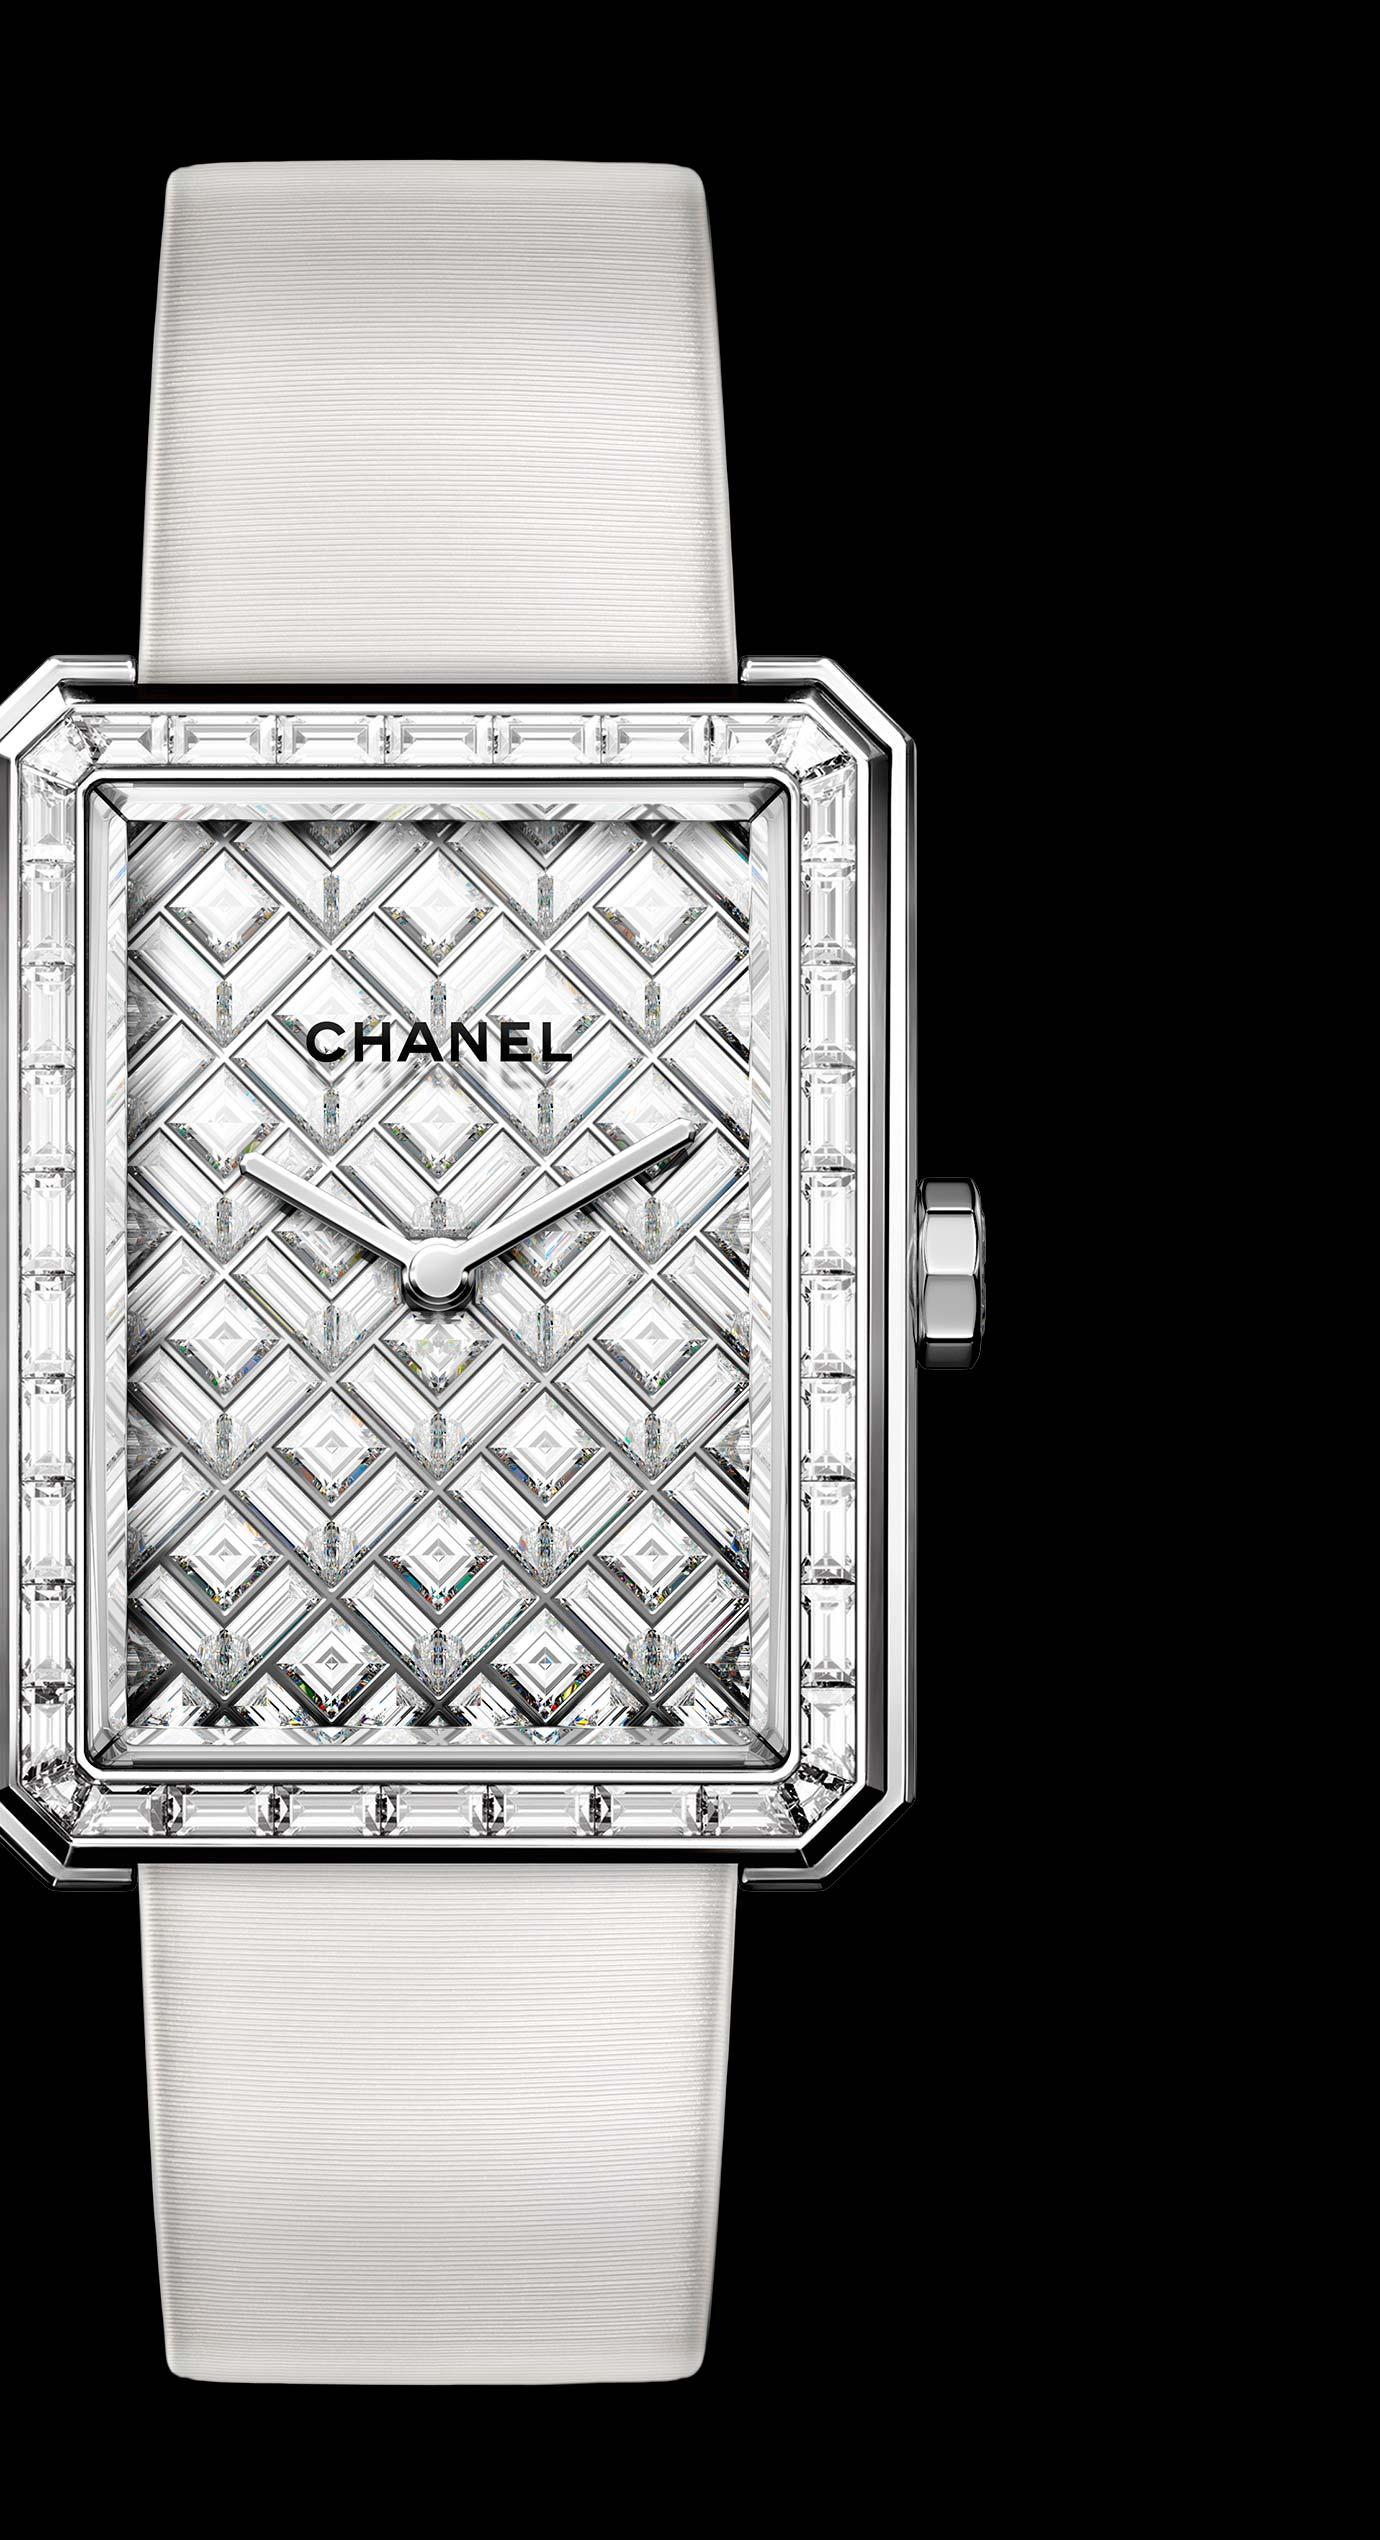 BOY·FRIEND ARTY DIAMONDS腕錶,18K白金,鑲嵌鑽石。 - 放大